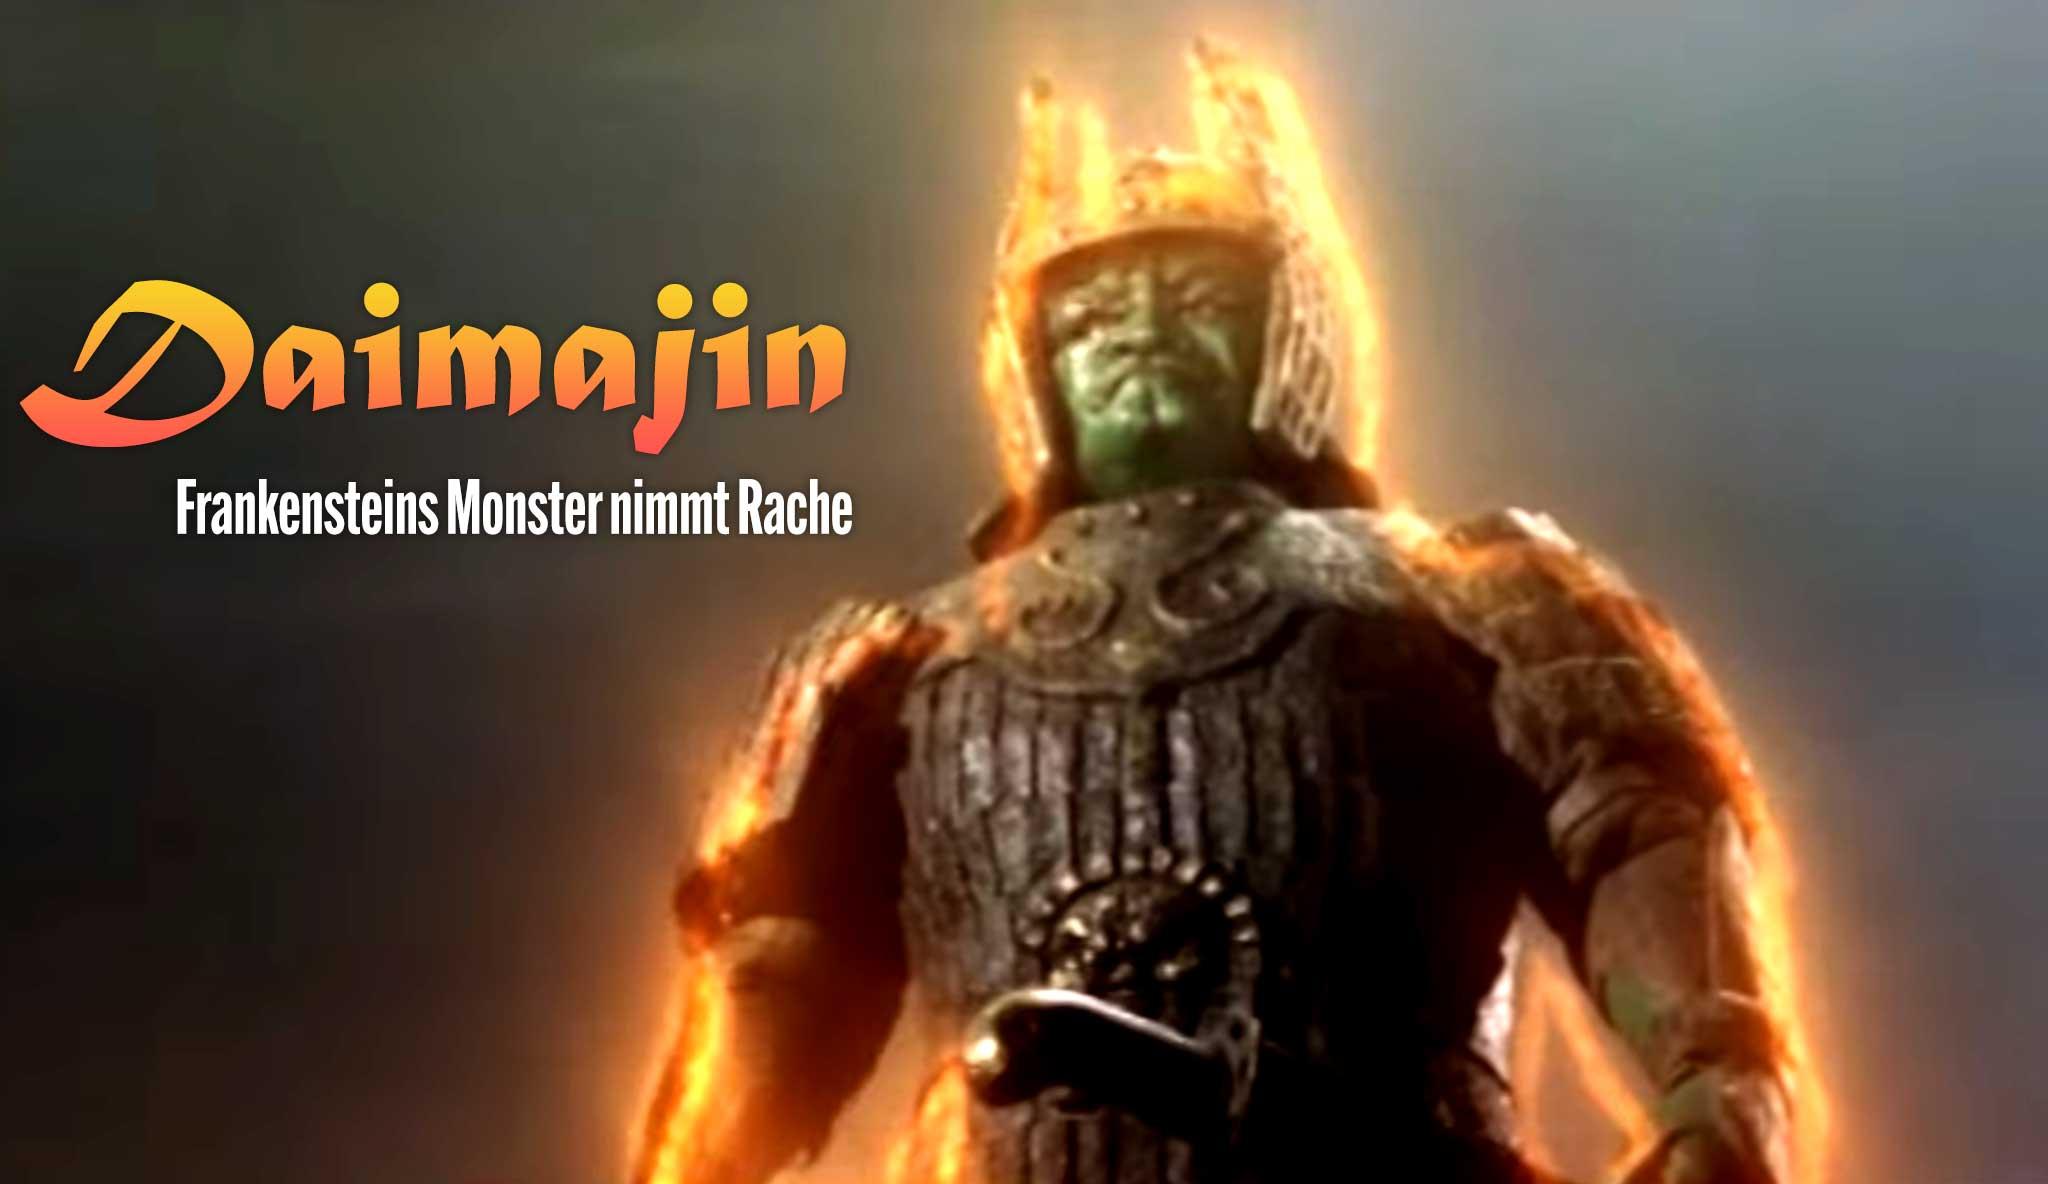 daimajin-frankensteins-monster-nimmt-rache\header.jpg